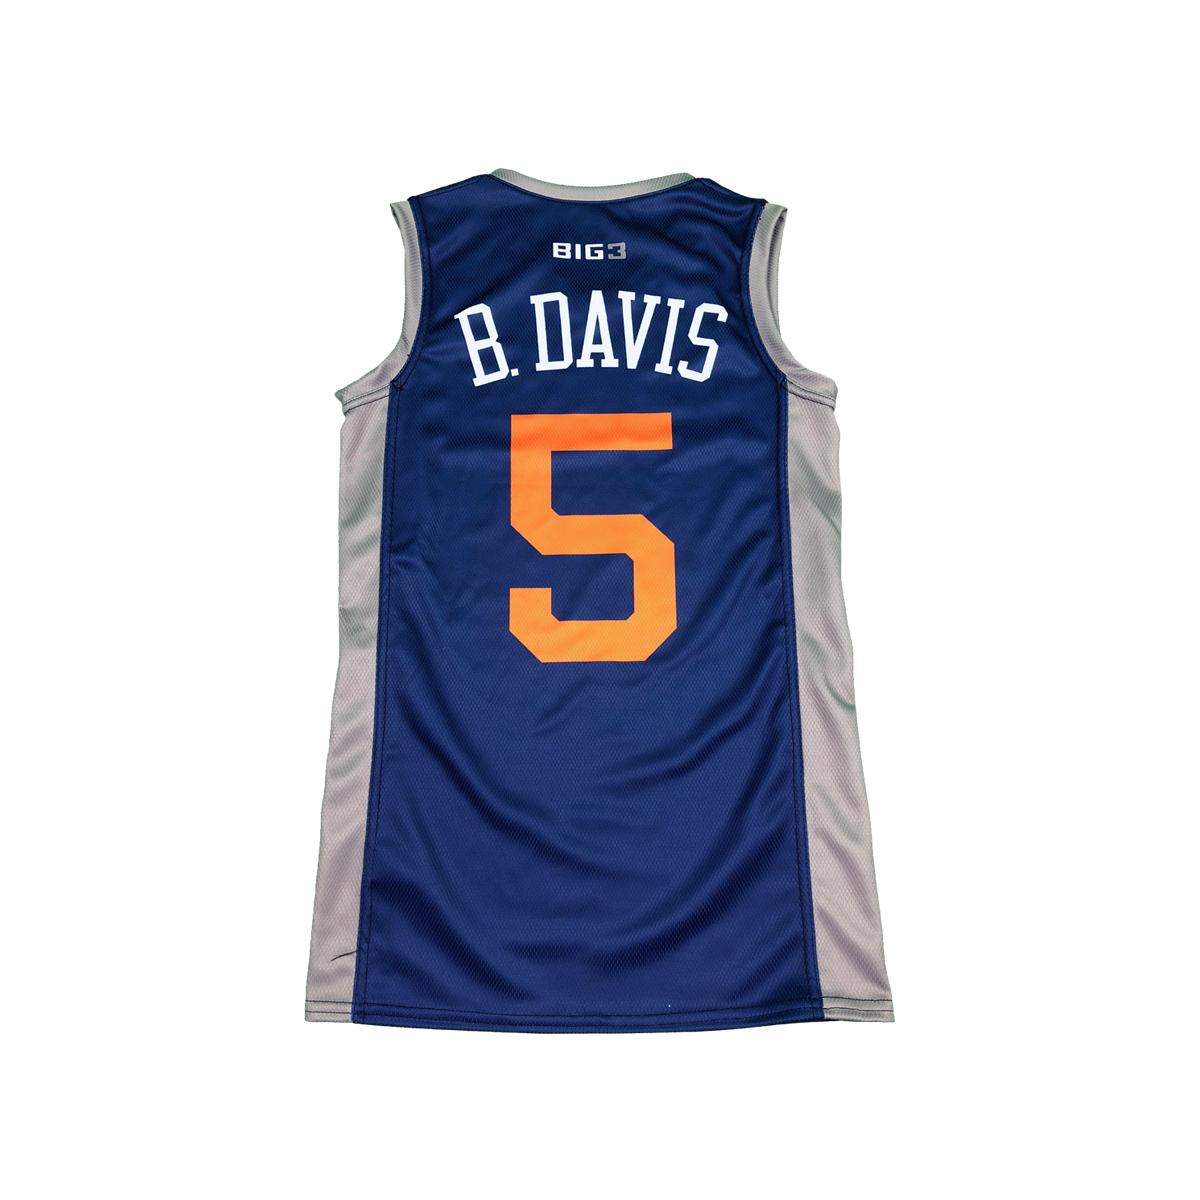 B. Davis Youth Jersey